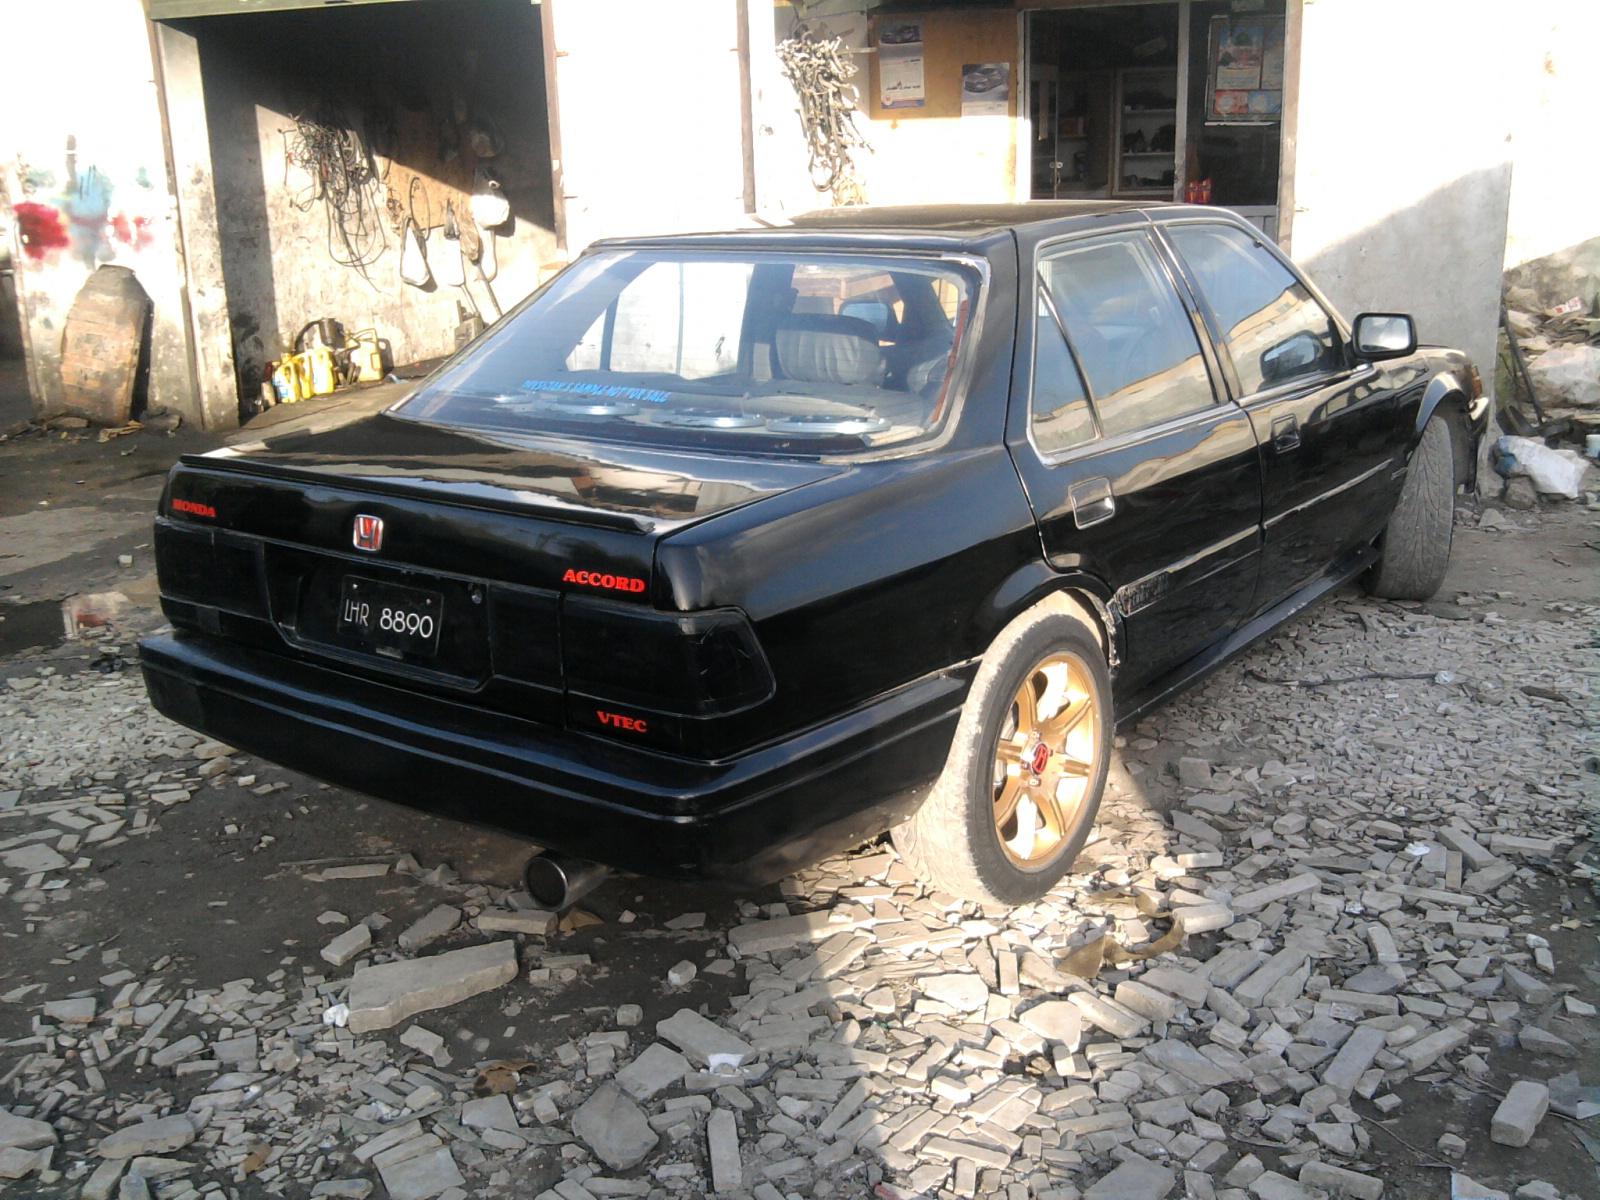 Honda Accord 1987 For Sale in Pakistan Honda Accord 1987 of